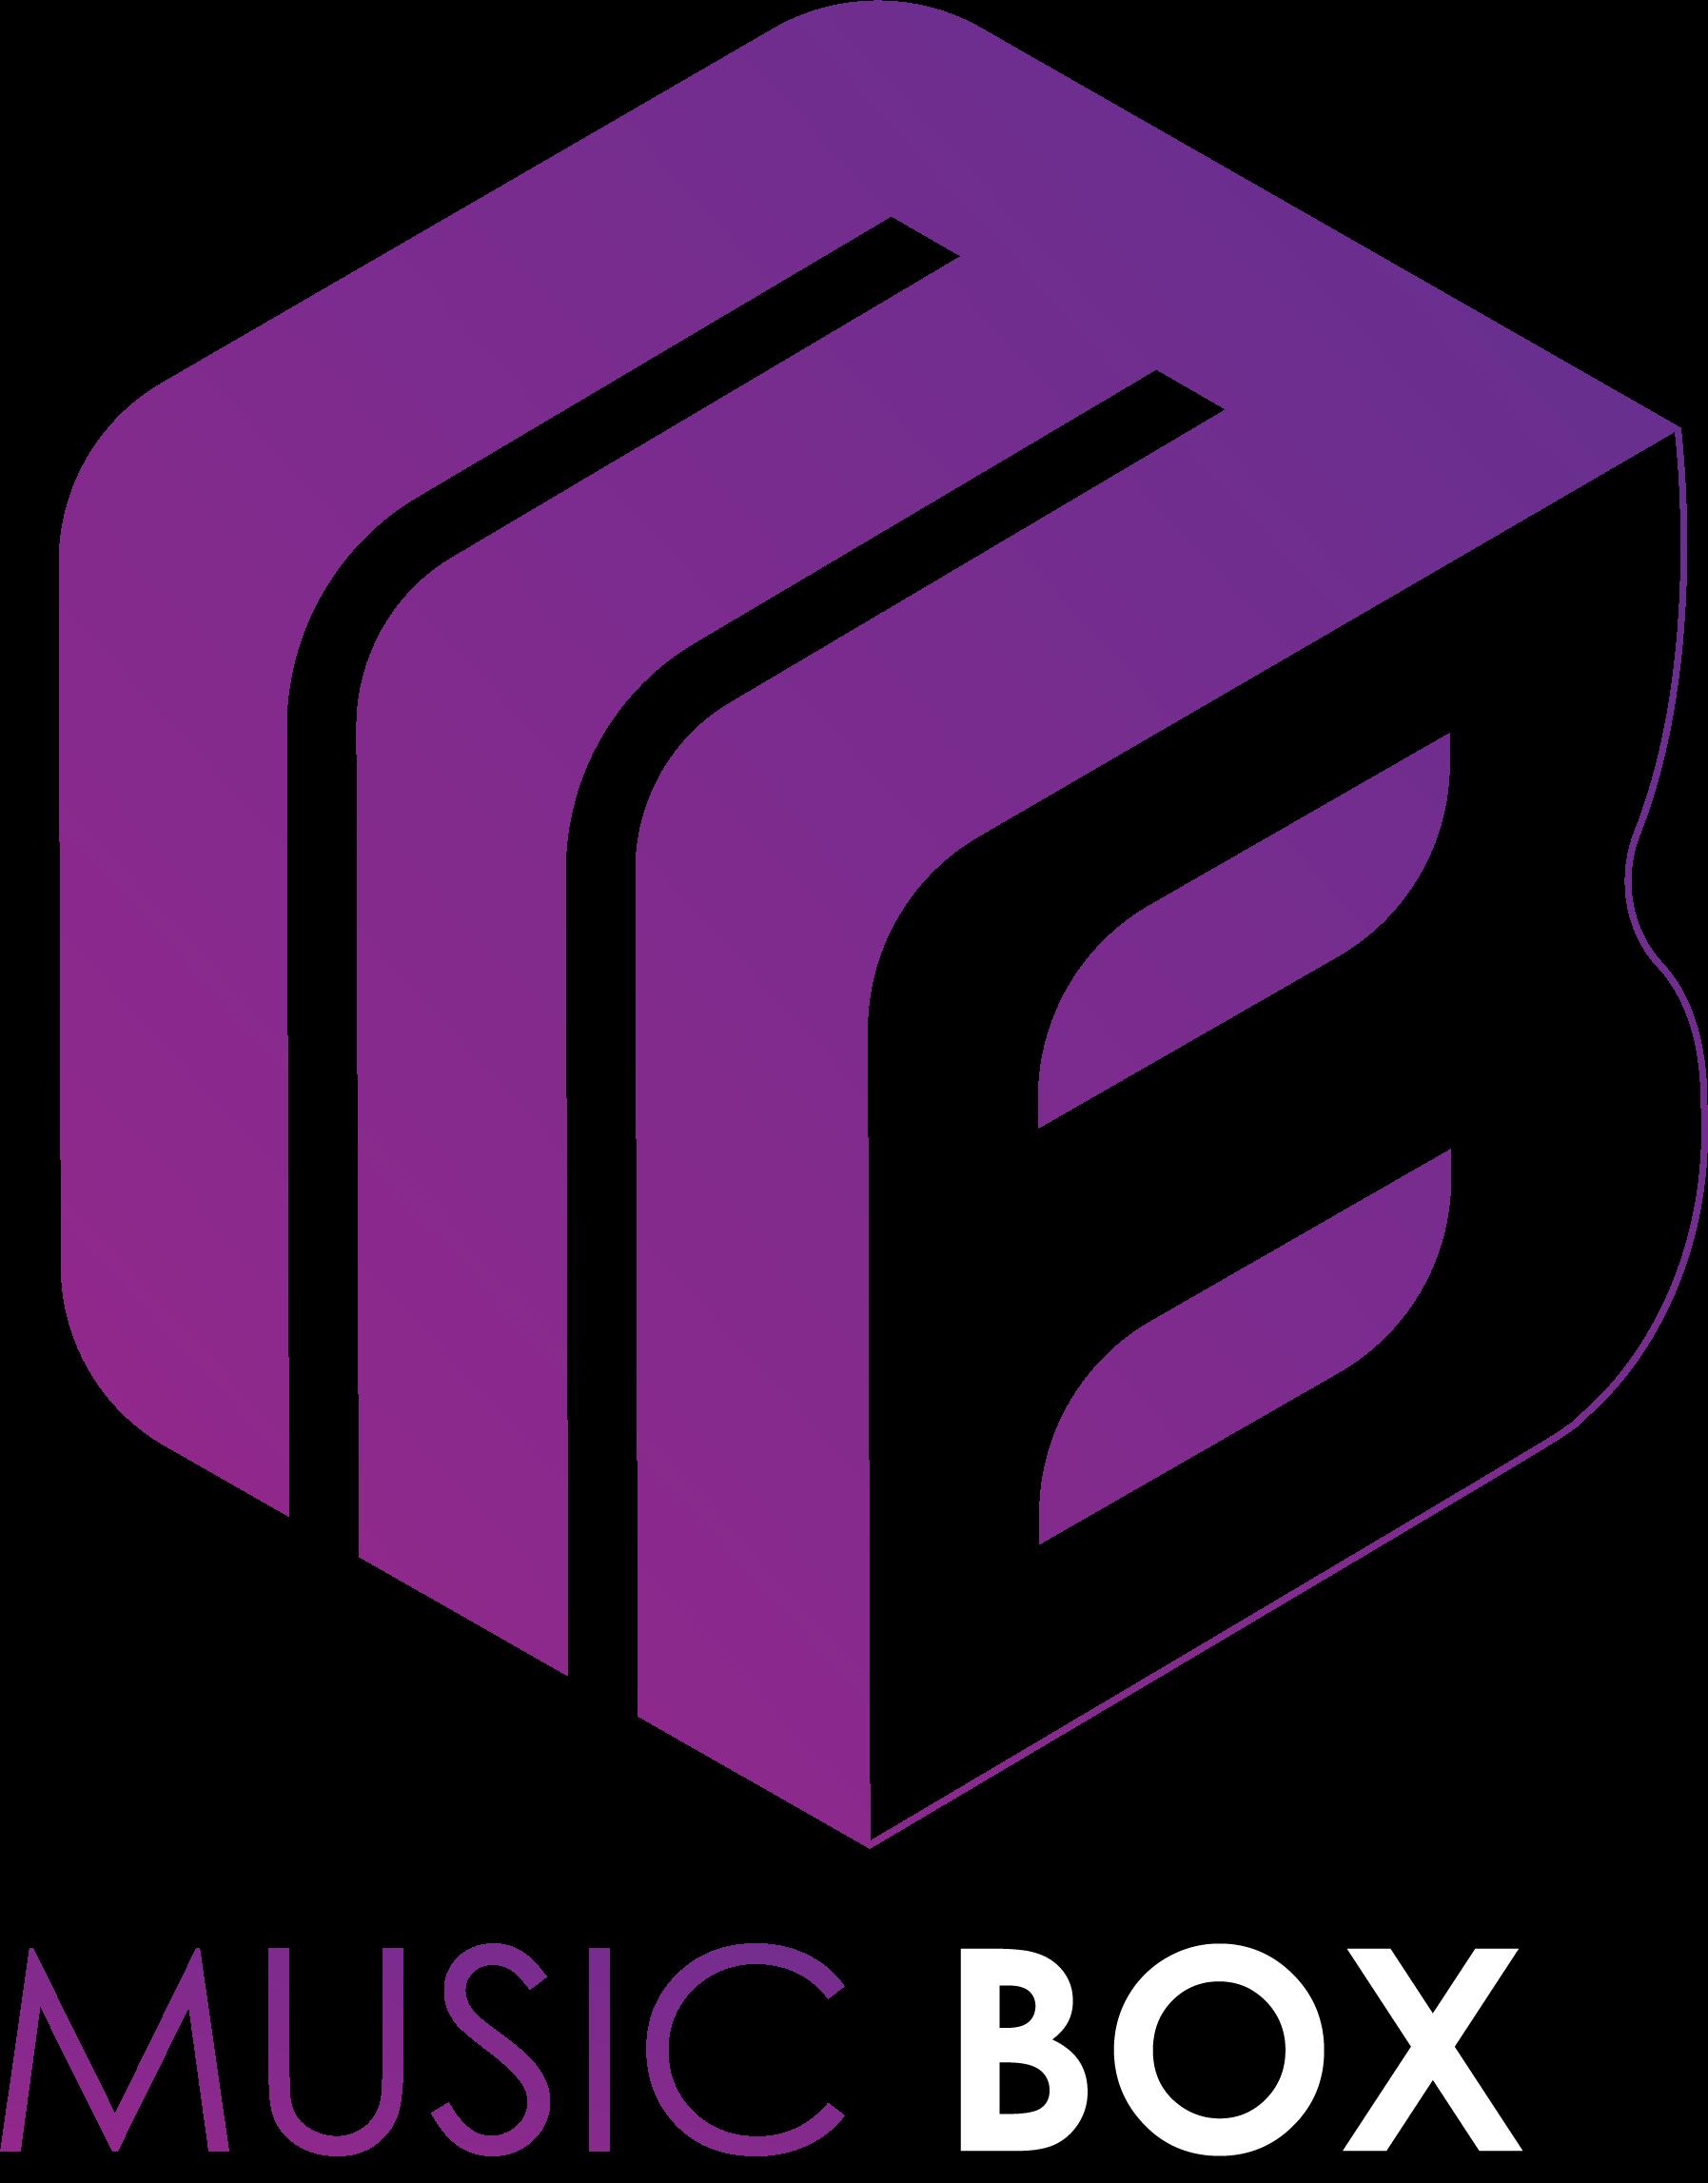 kol-media-music-box